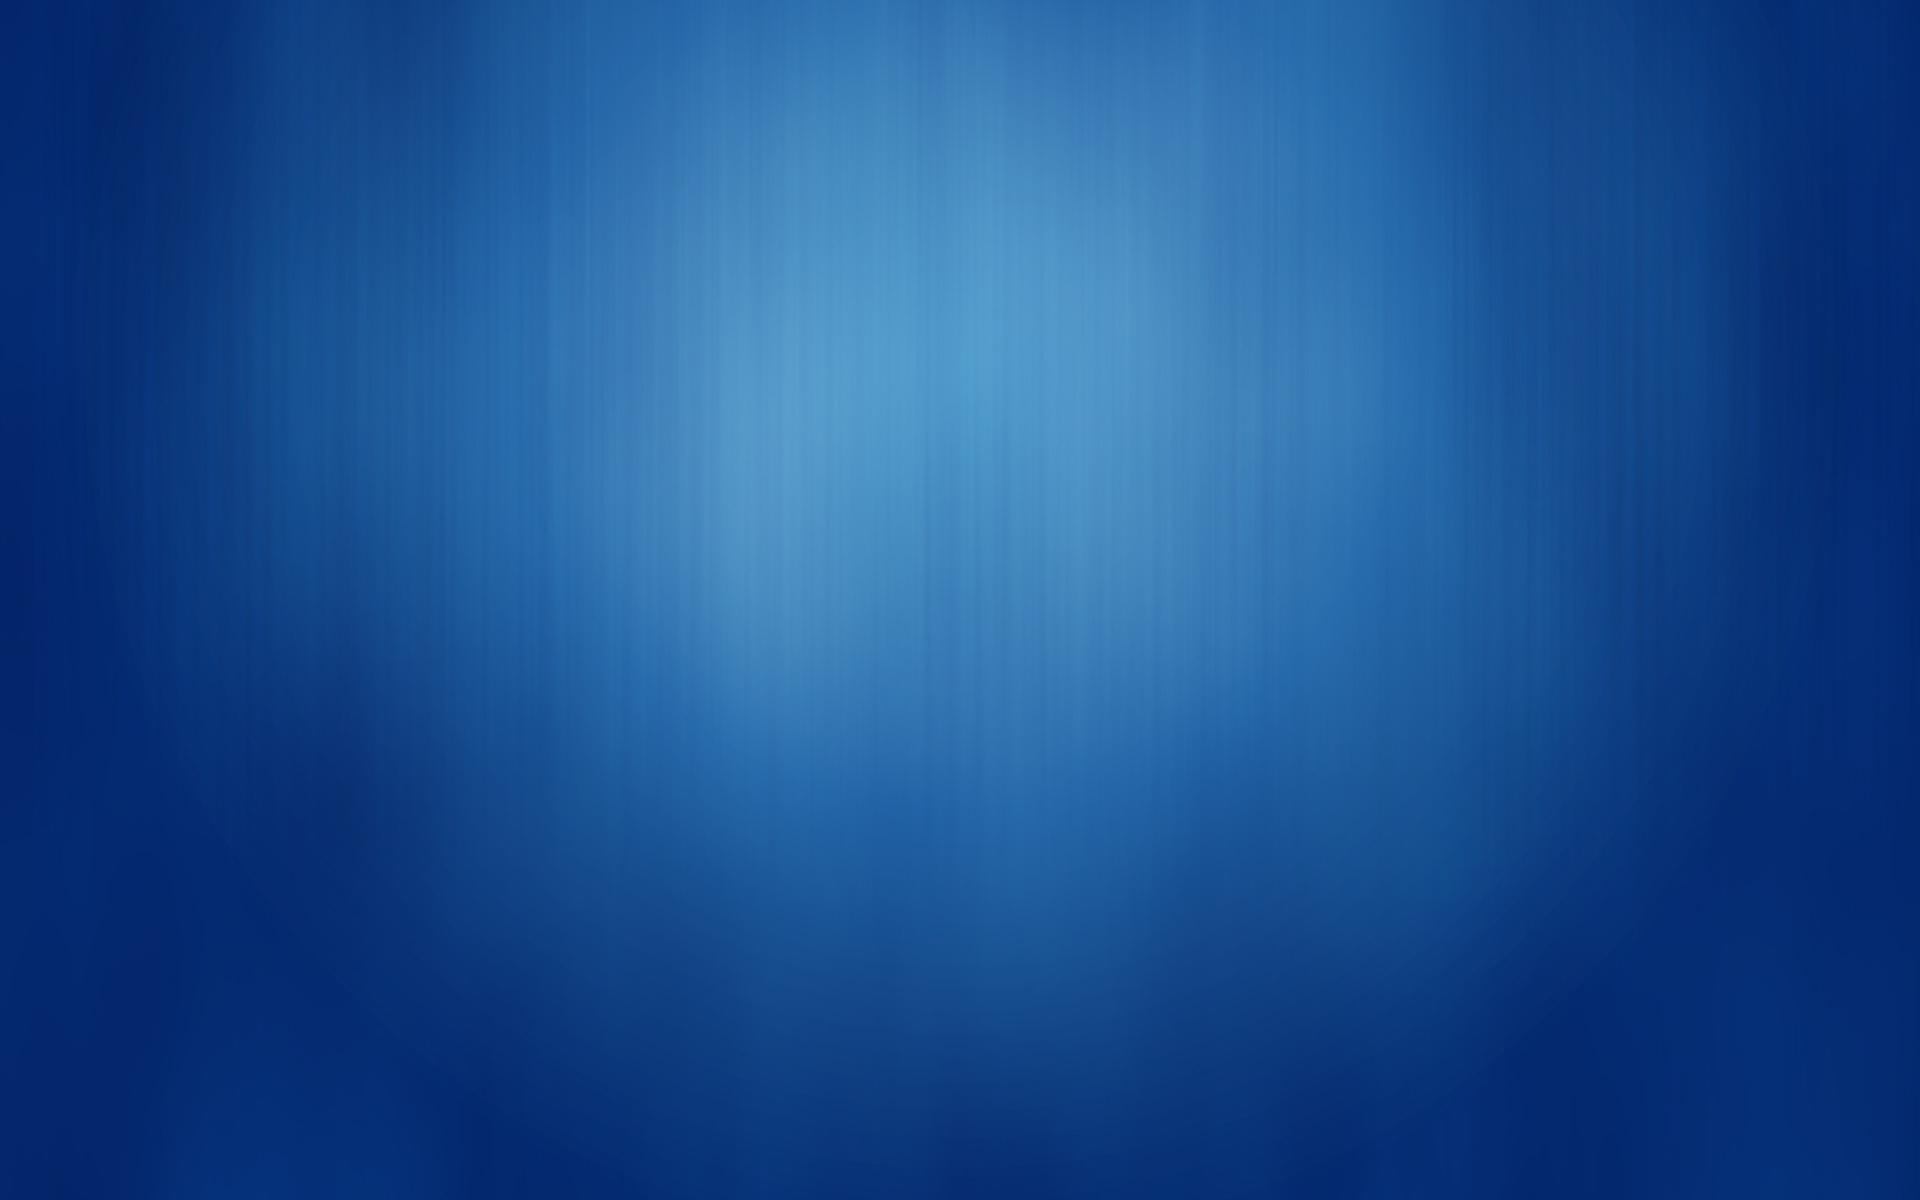 Blue Wallpaper   WallpaperNebula 1920x1200